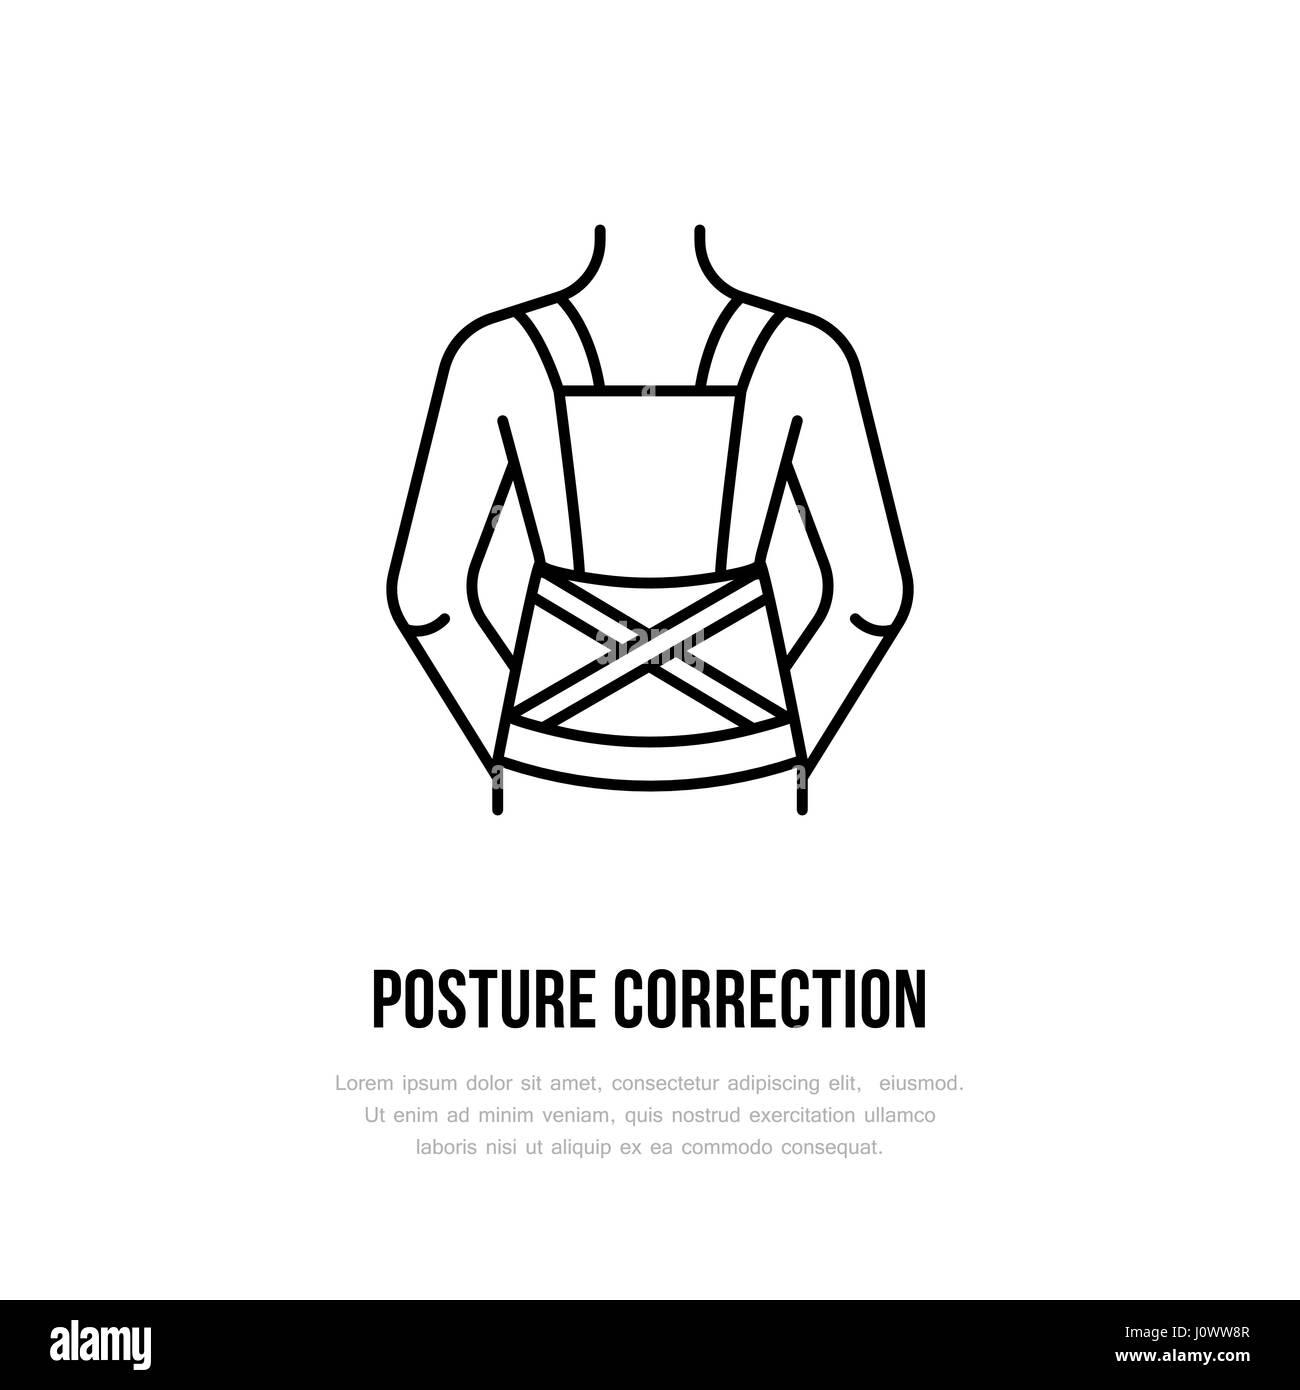 Posture correction icon, line logo. Flat sign for trauma rehabilitation equipment shop - Stock Image